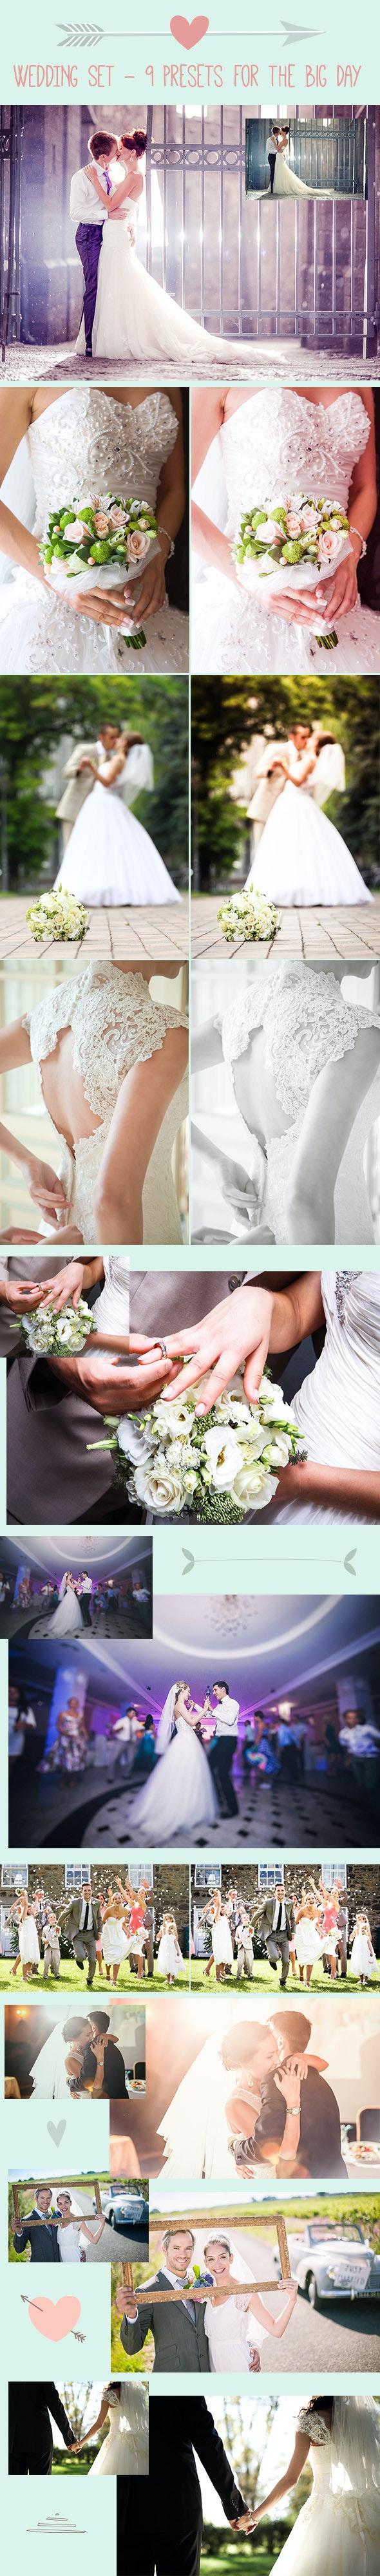 9 Wedding Preset for the Big Day - Wedding Lightroom Presets